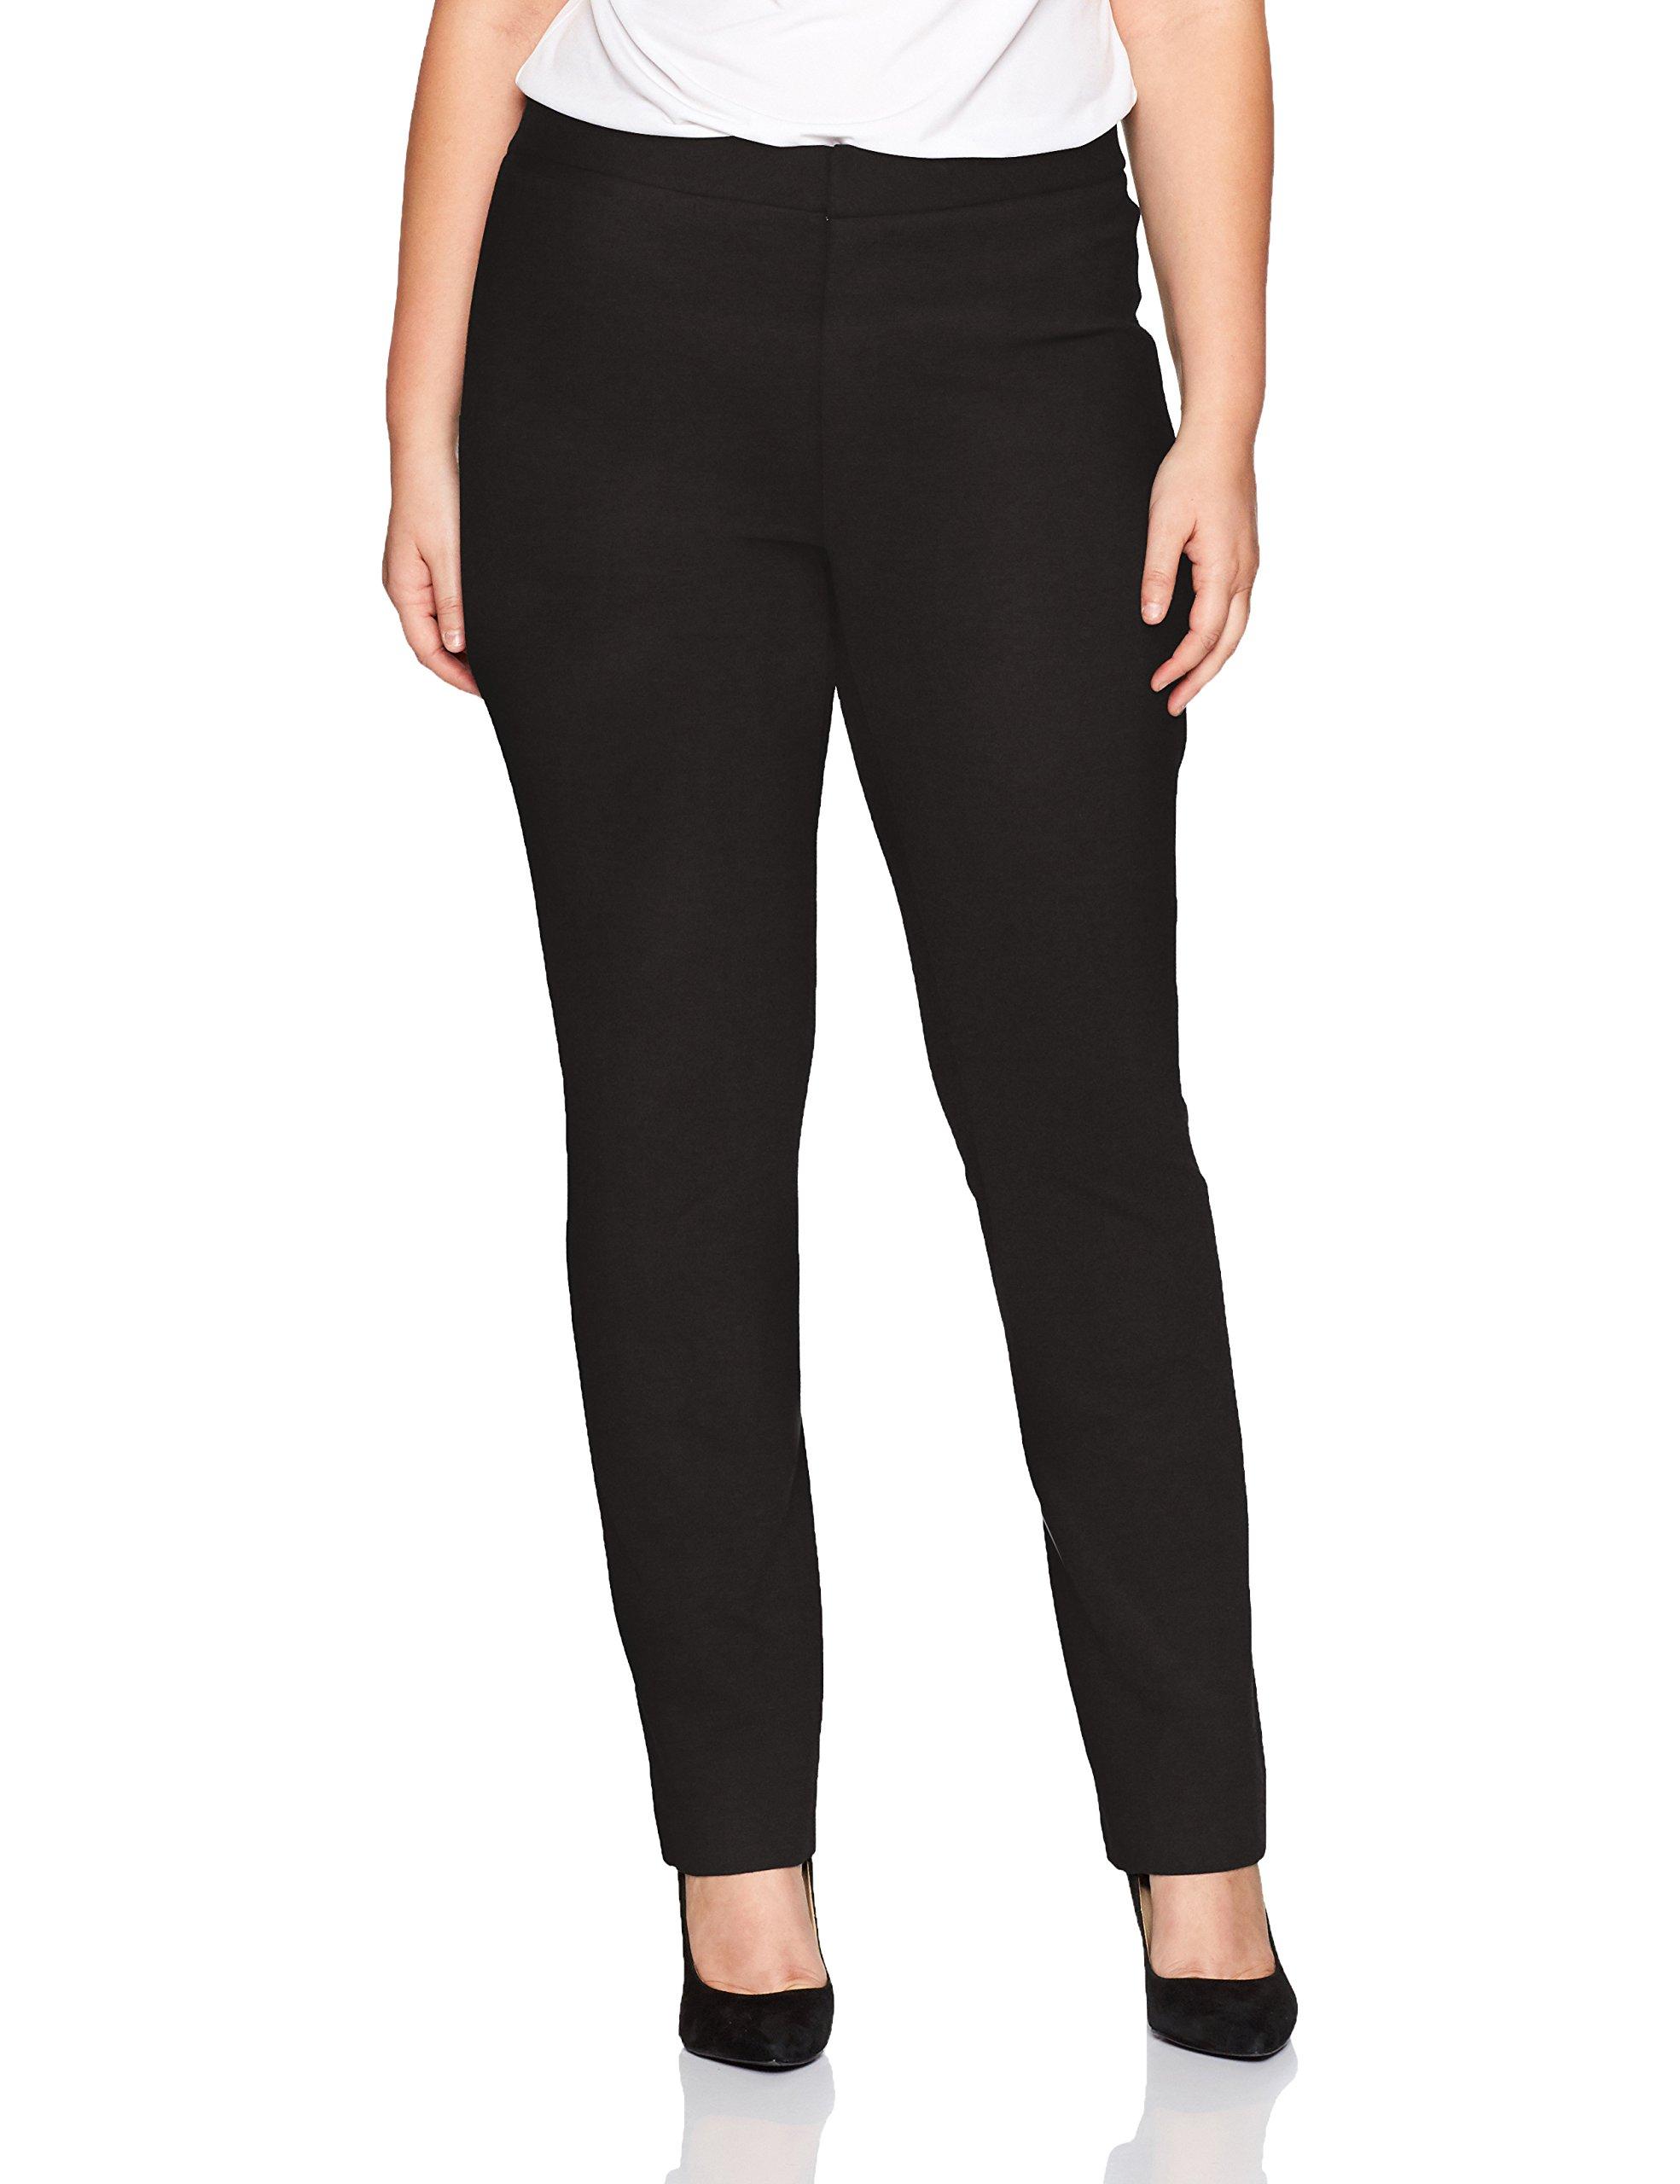 NYDJ Women's Plus Size Ponte Trouser, Black, 18W